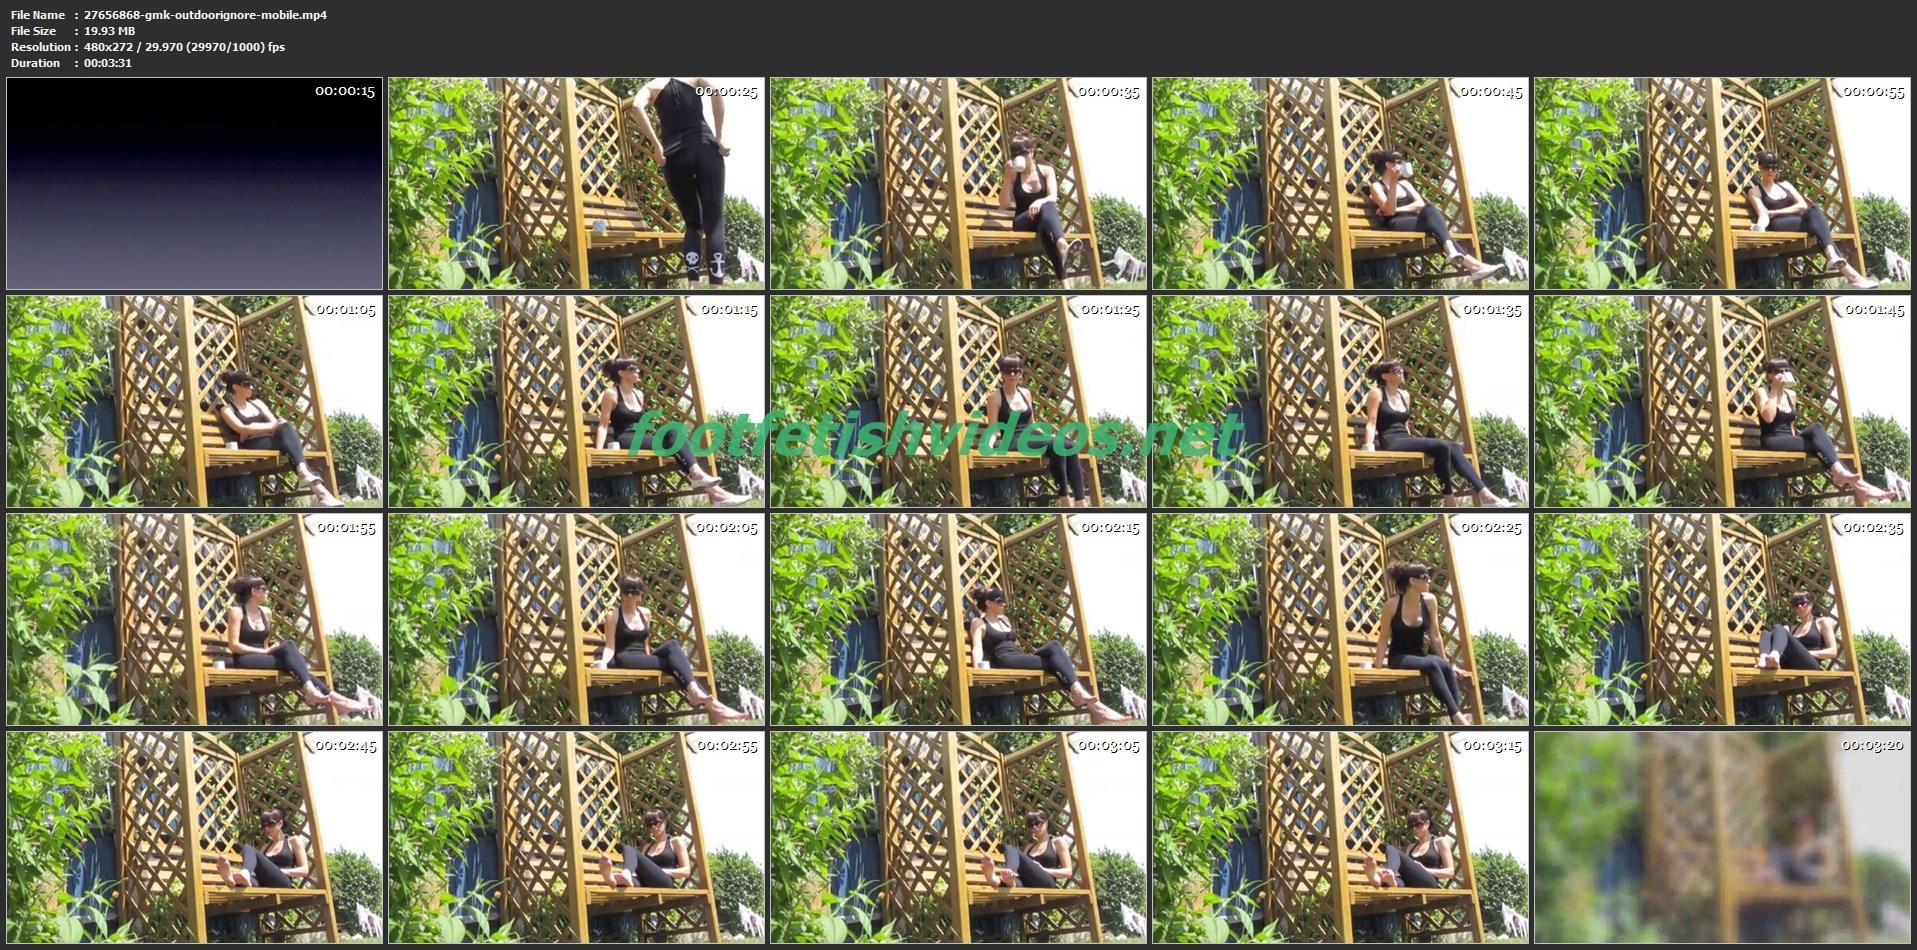 goddessmskelly-27656868-gmk-outdoorignore-mobile-mp4